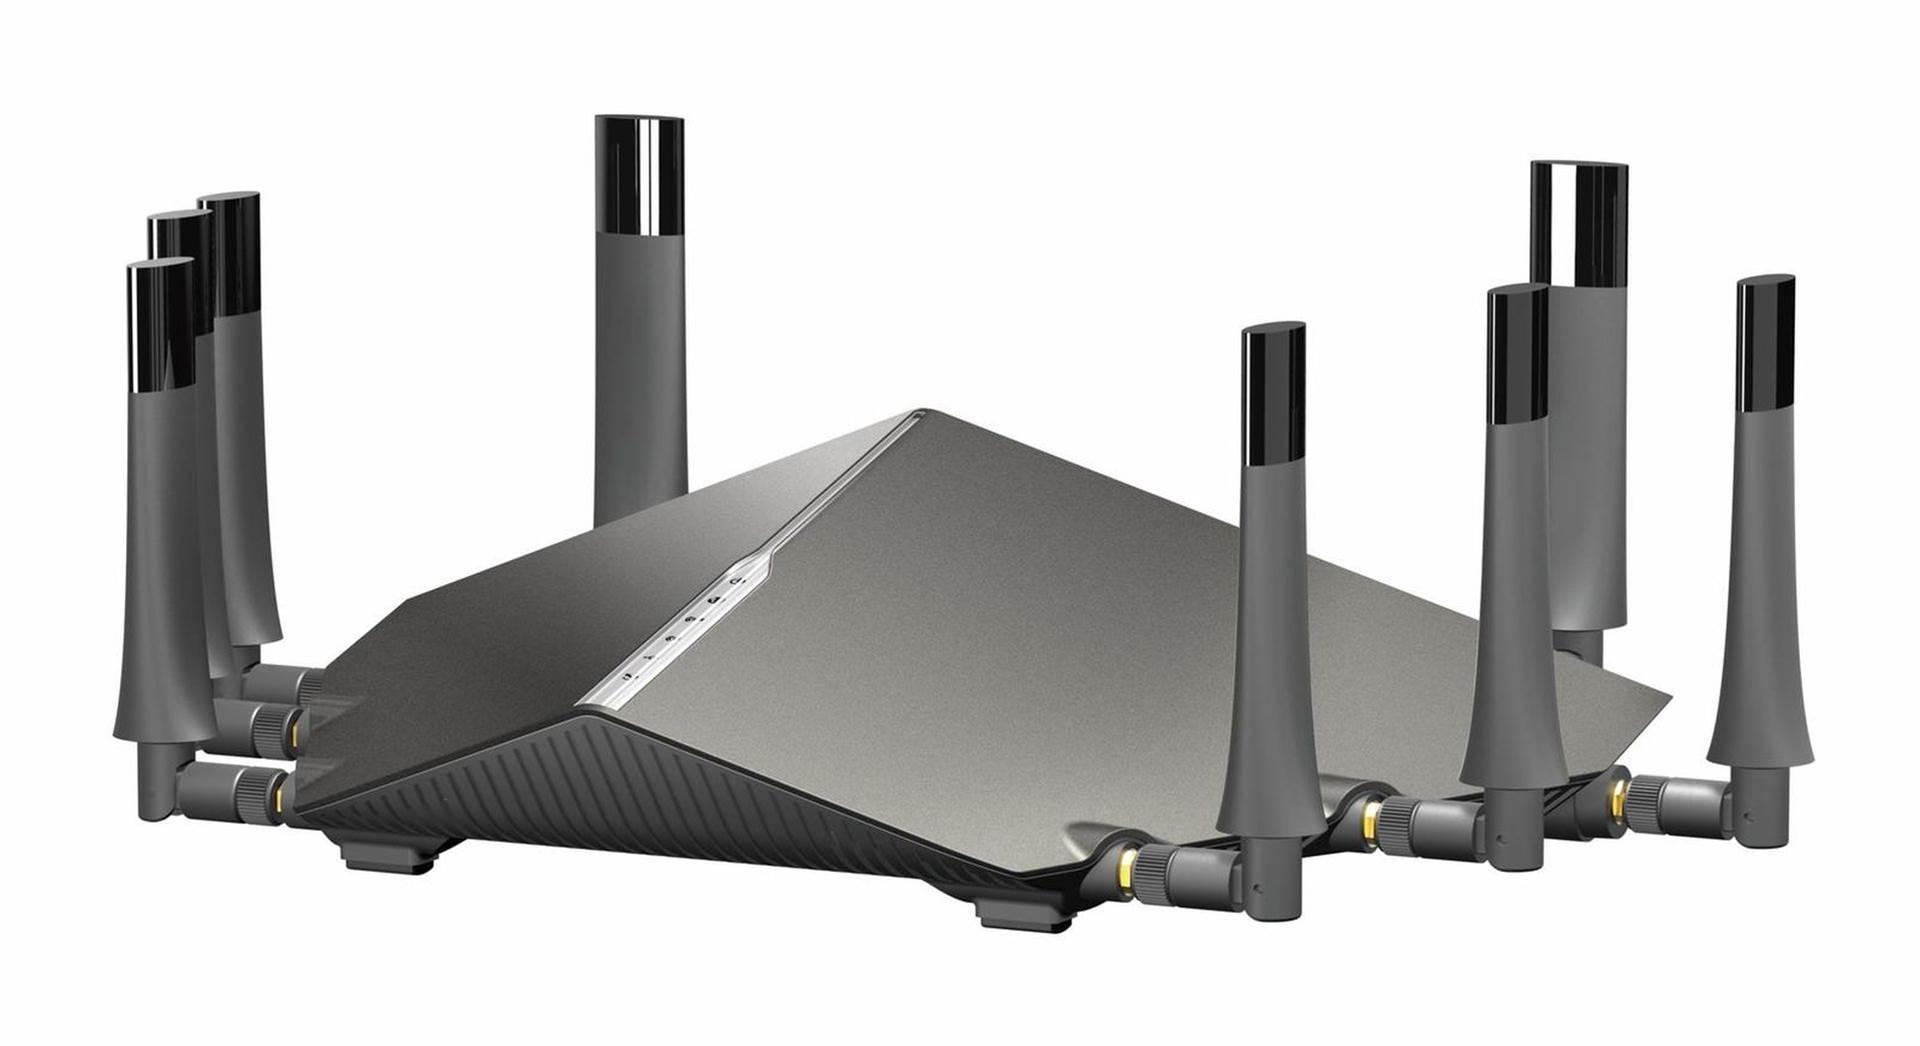 Review: D-Link DSL-5300 Cobra AC5300 MU-MIMO Wi-Fi Modem Router